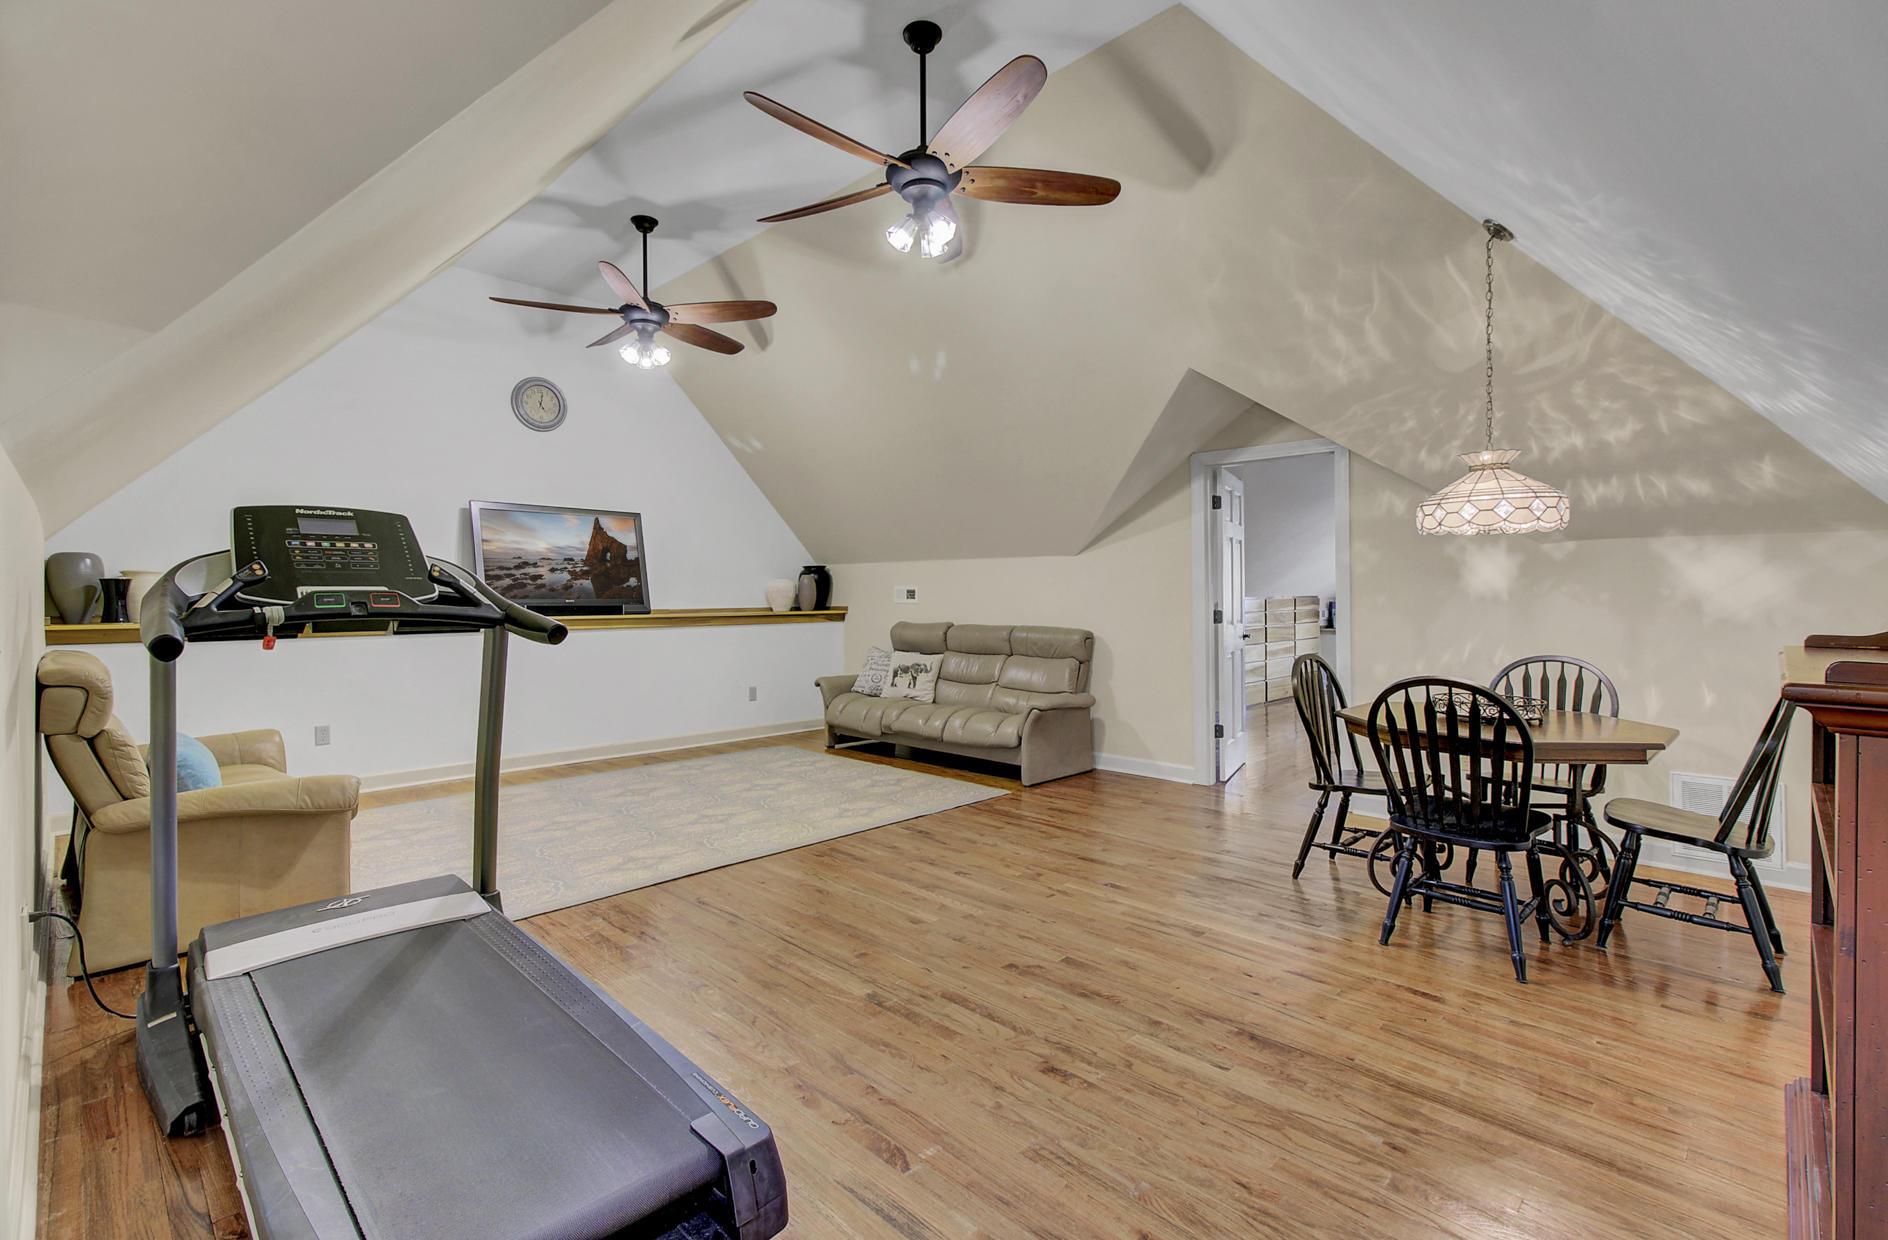 Dunes West Homes For Sale - 4123 Colonel Vanderhorst, Mount Pleasant, SC - 2